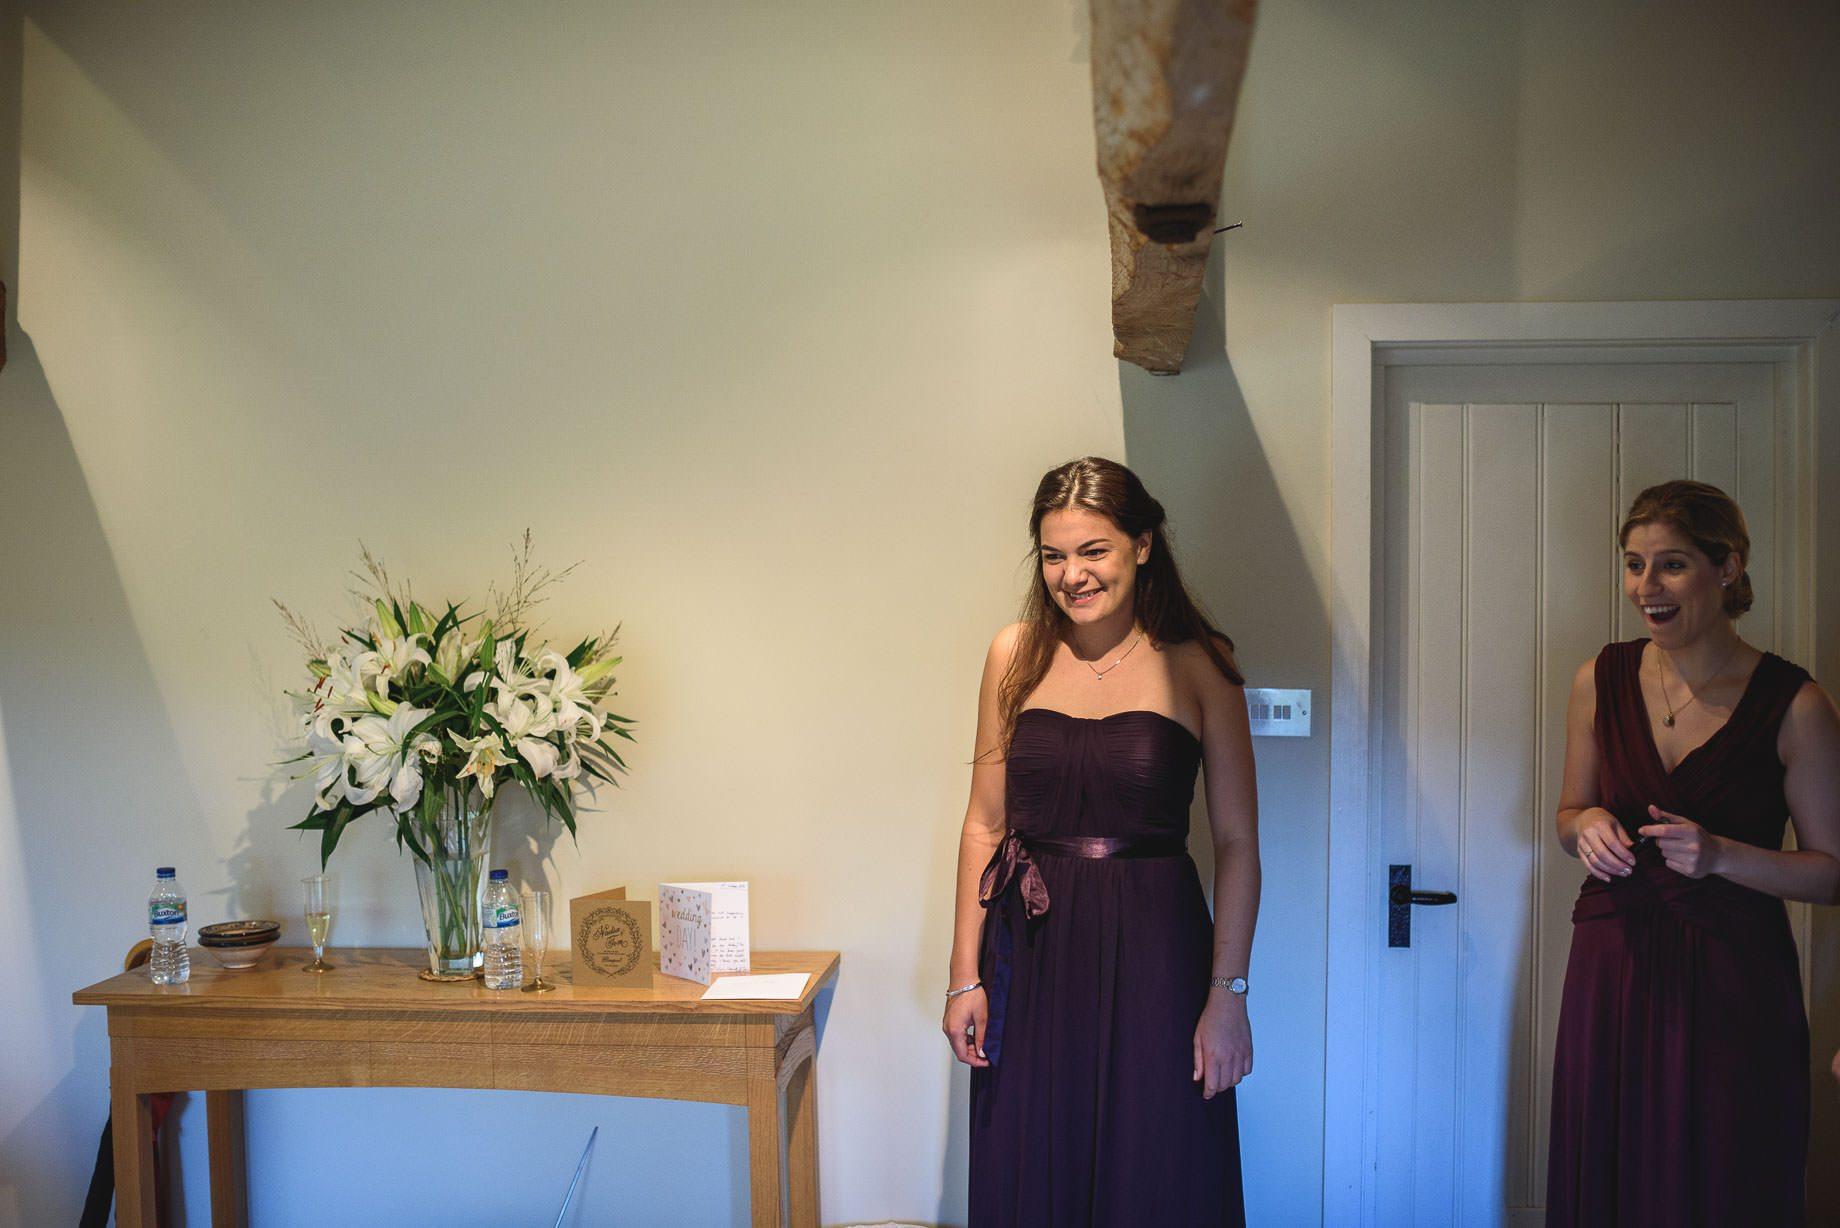 bury-court-barn-wedding-photography-guy-collier-photography-nadia-tom-32-of-184